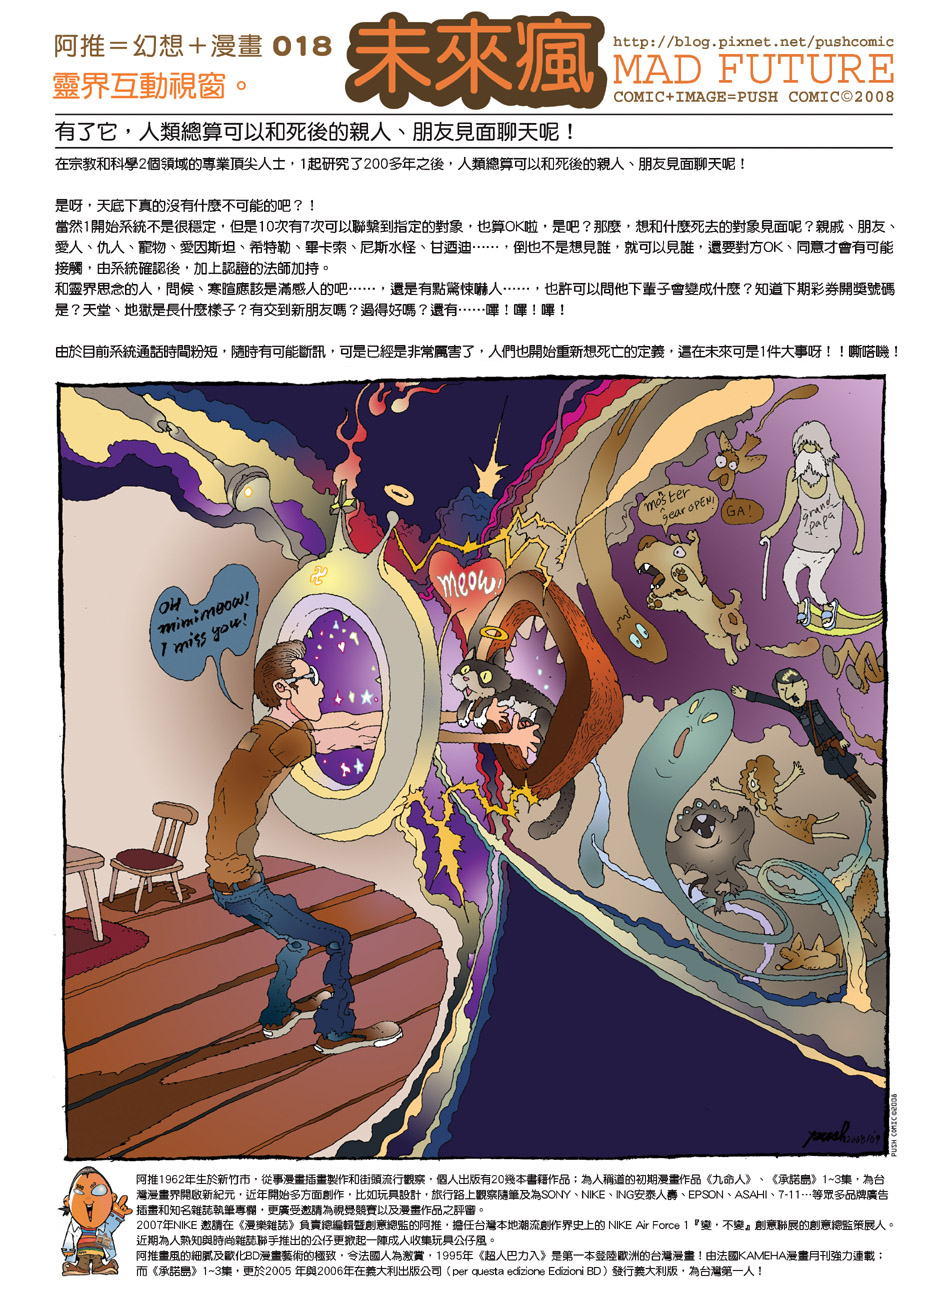 Ming-018-MF-byPUSH-S.jpg